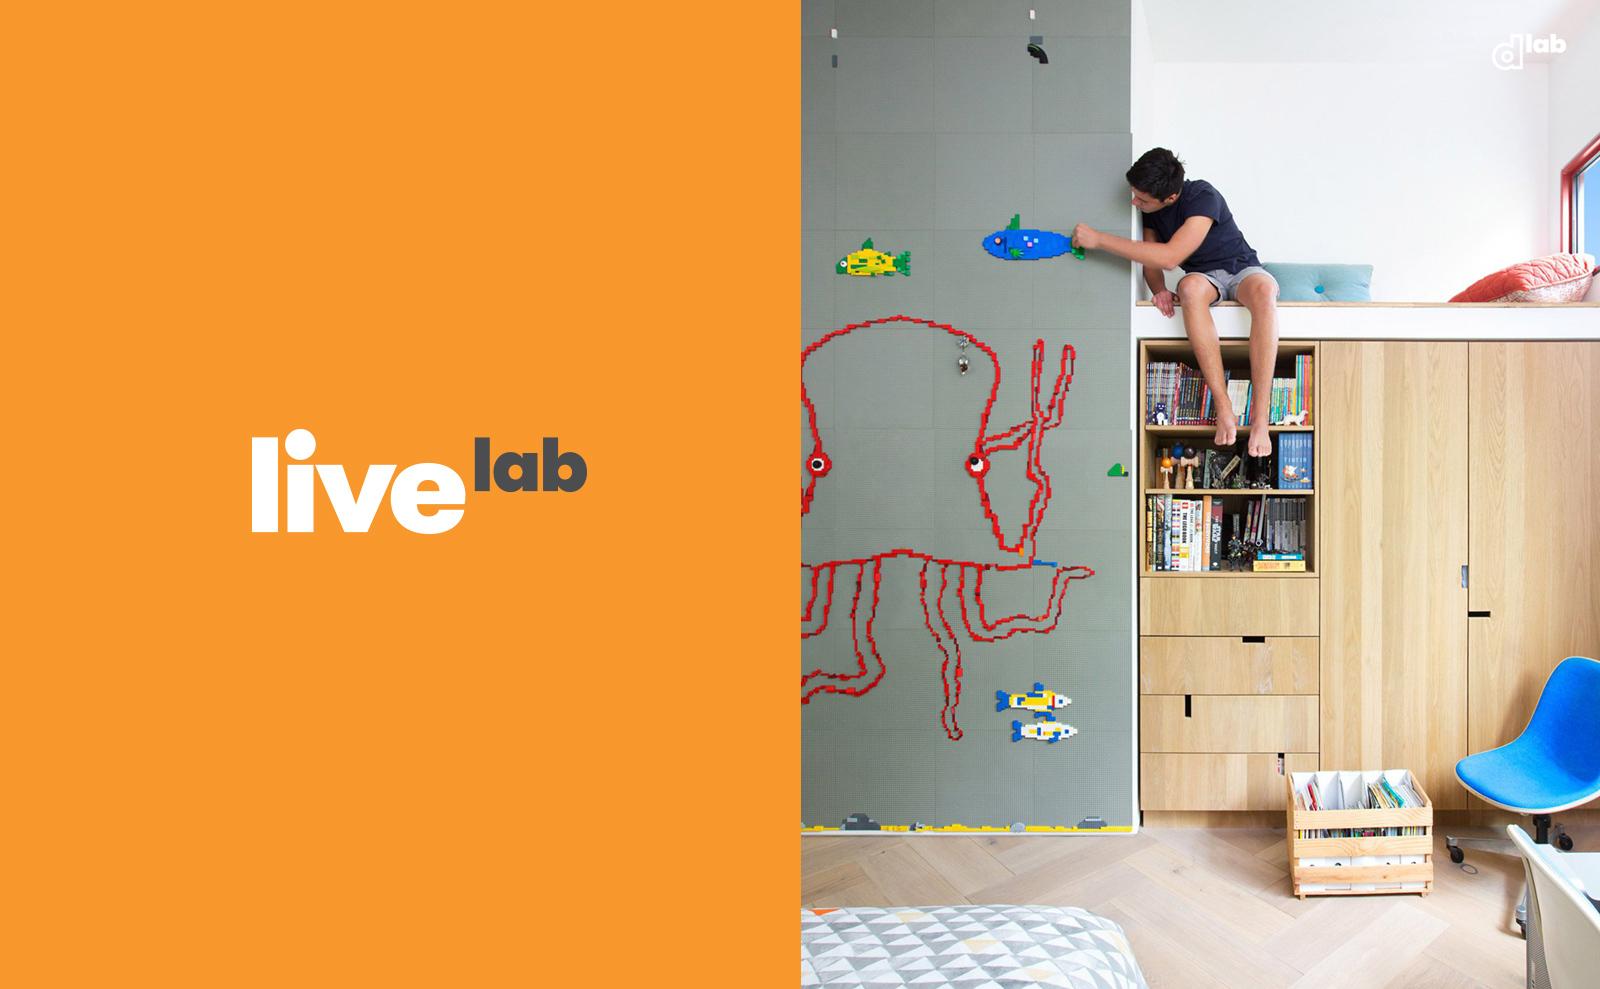 LiveLab for Amazon DreamLab